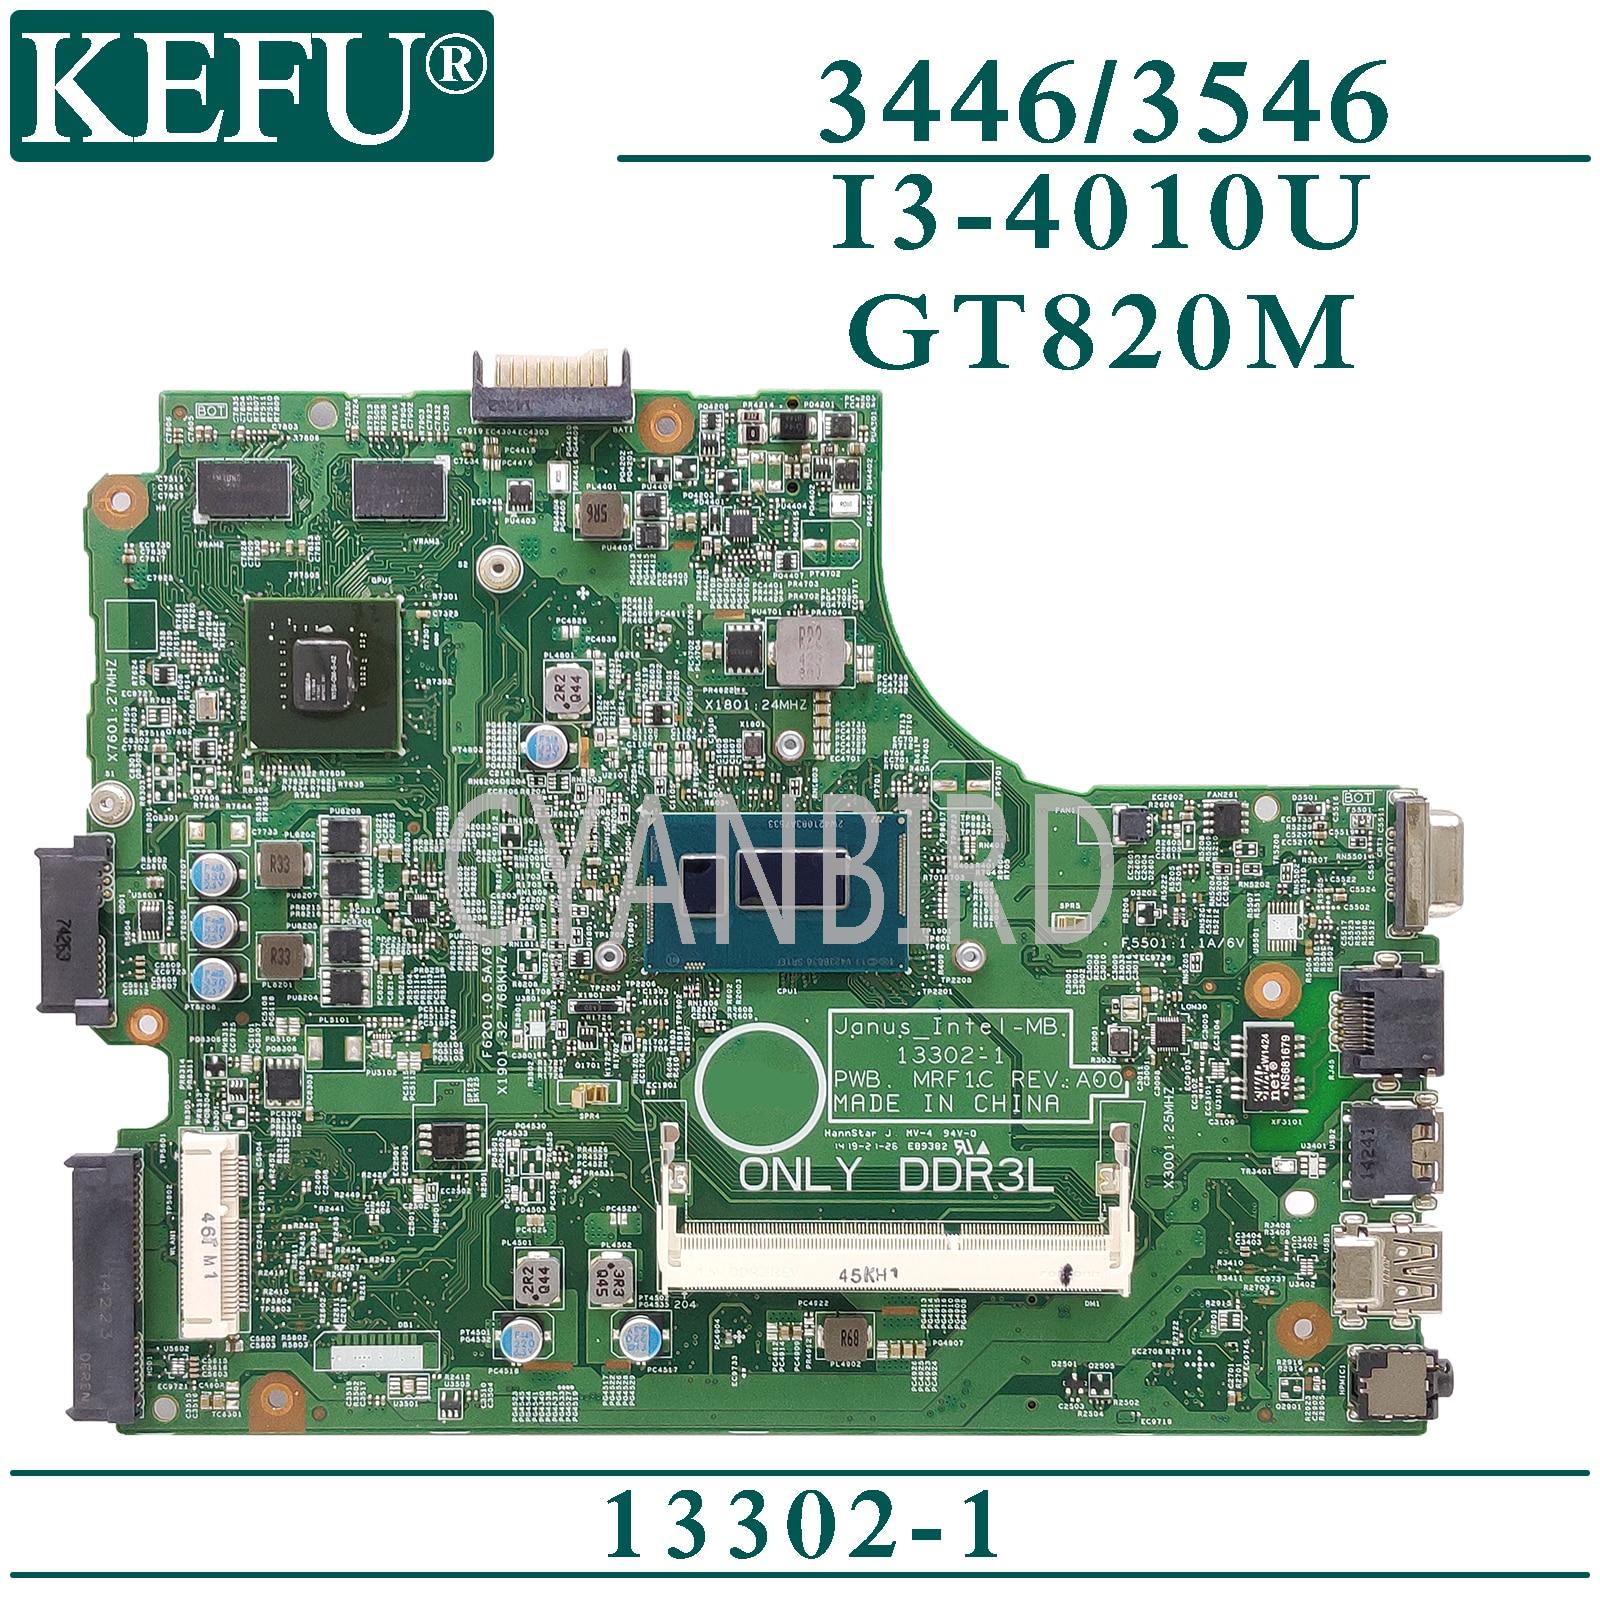 KEFU 13302-1 لوحة رئيسية أصلية لـ Dell Vostro 14-3446 15-3546 مع لوحة أم للكمبيوتر المحمول GT820M I3-4010U